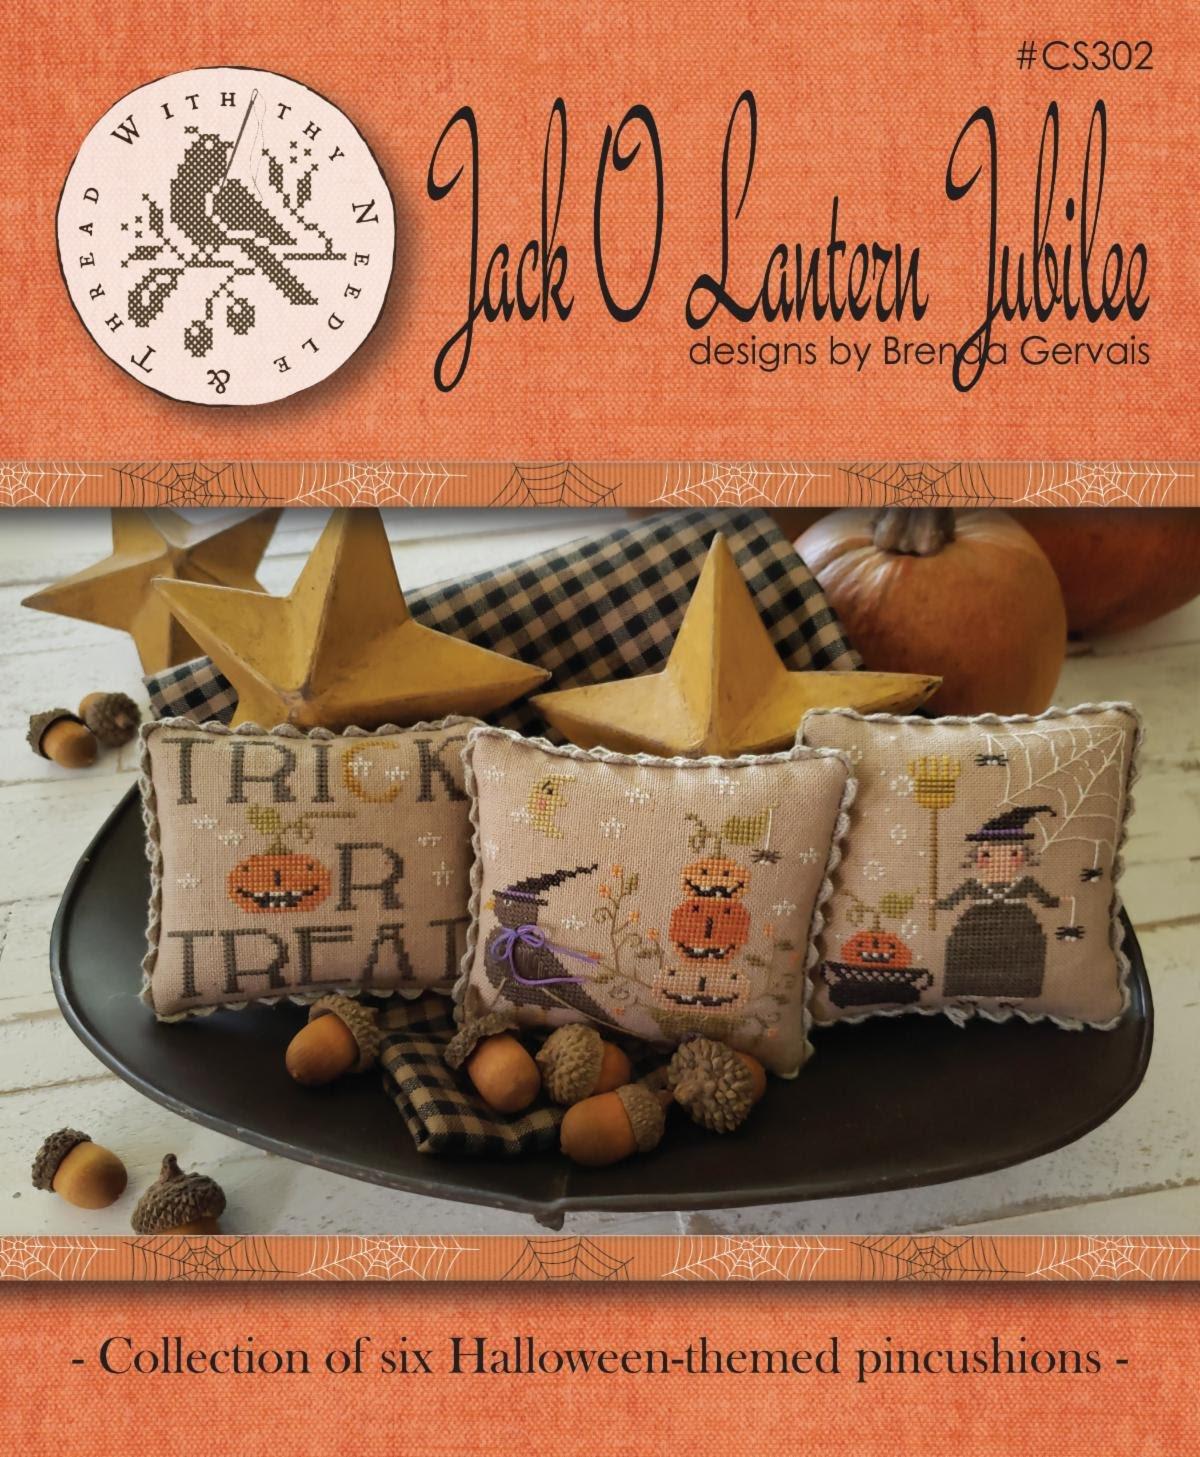 With Thy Needle and Thread - Jack O Lantern Jubilee